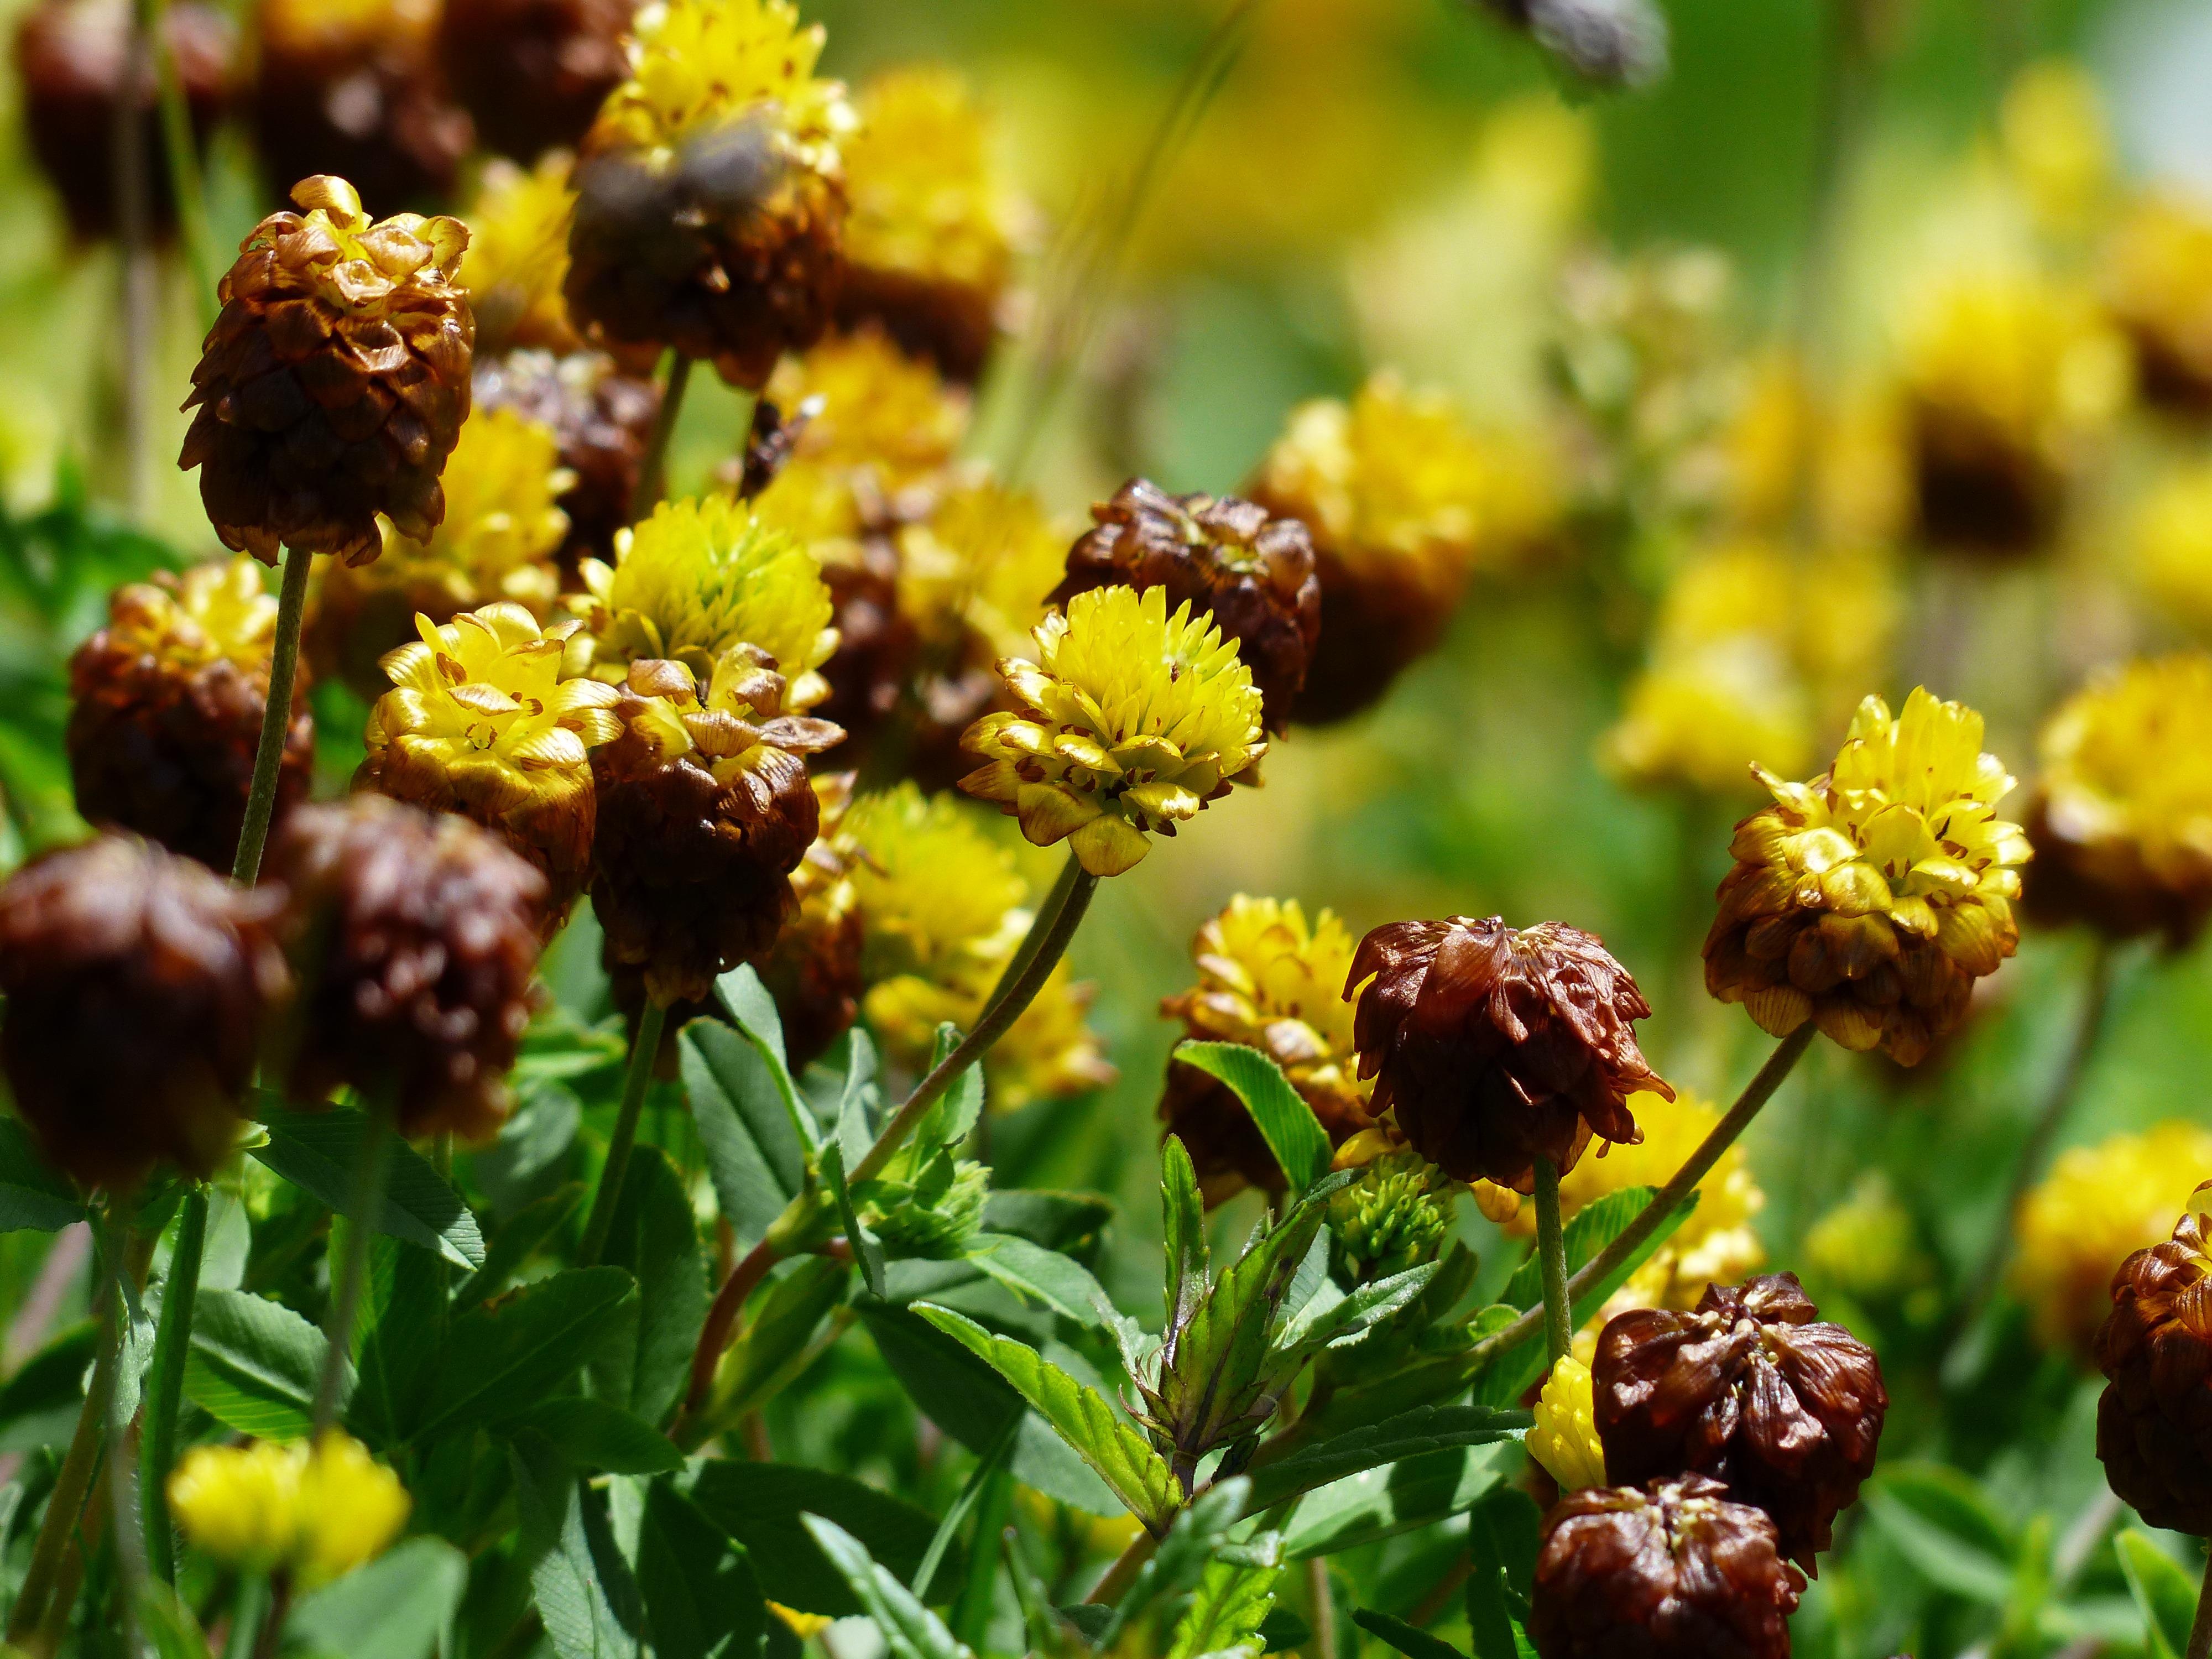 free images nature blossom food produce botany yellow